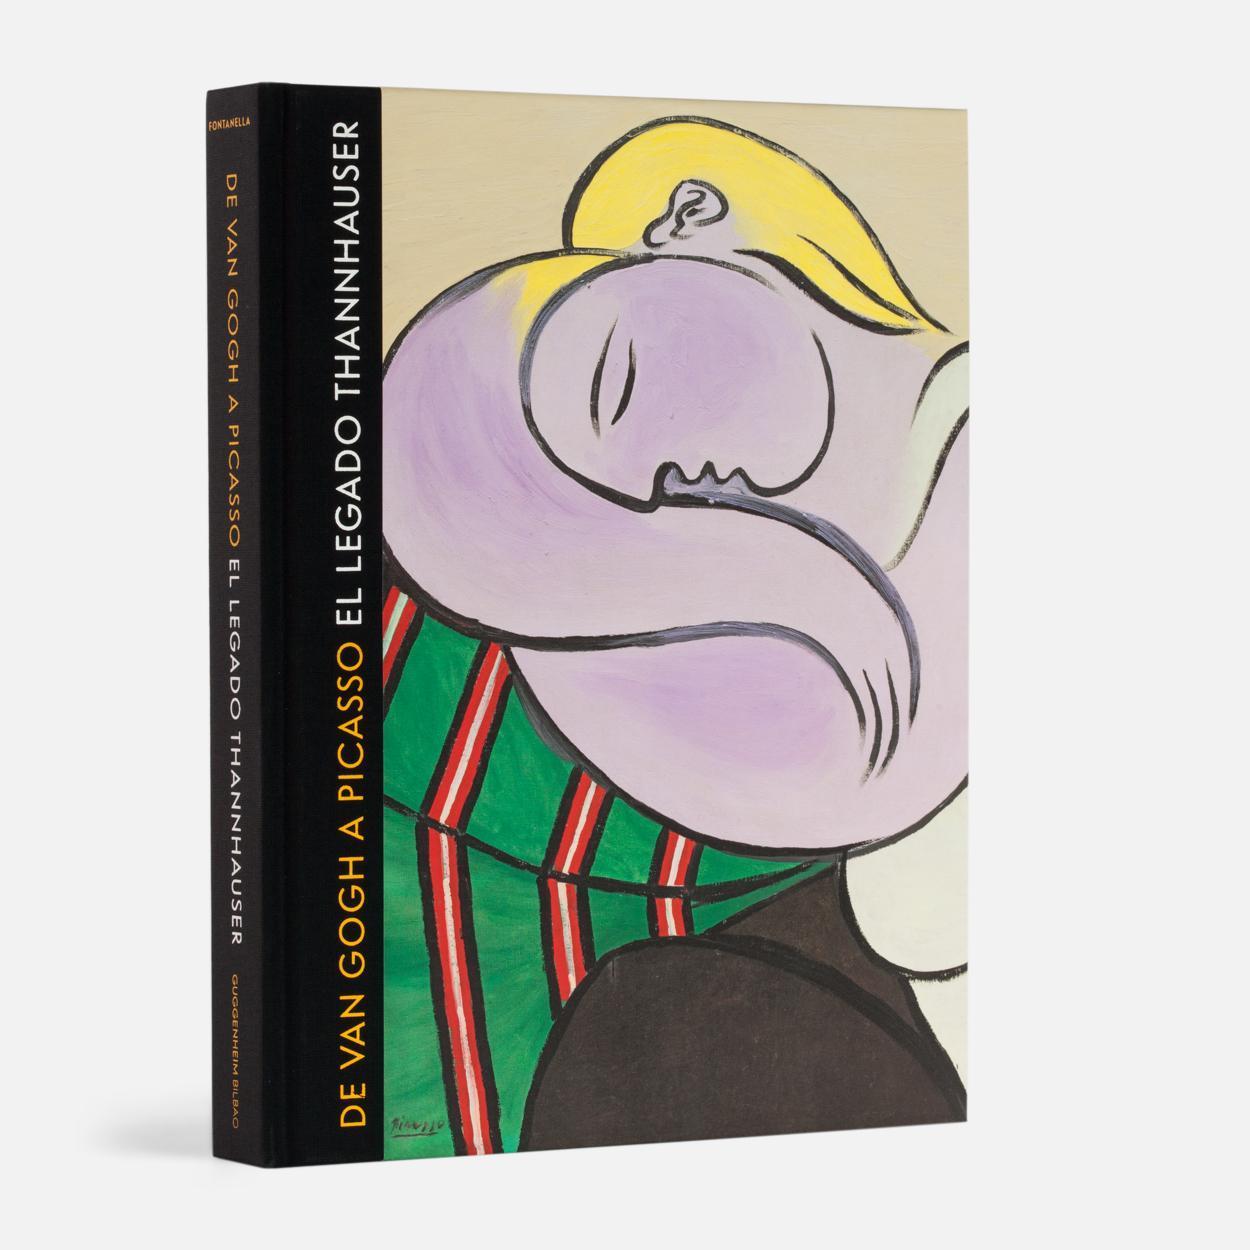 De Van Gogh a Picasso. El legado Thannhauser